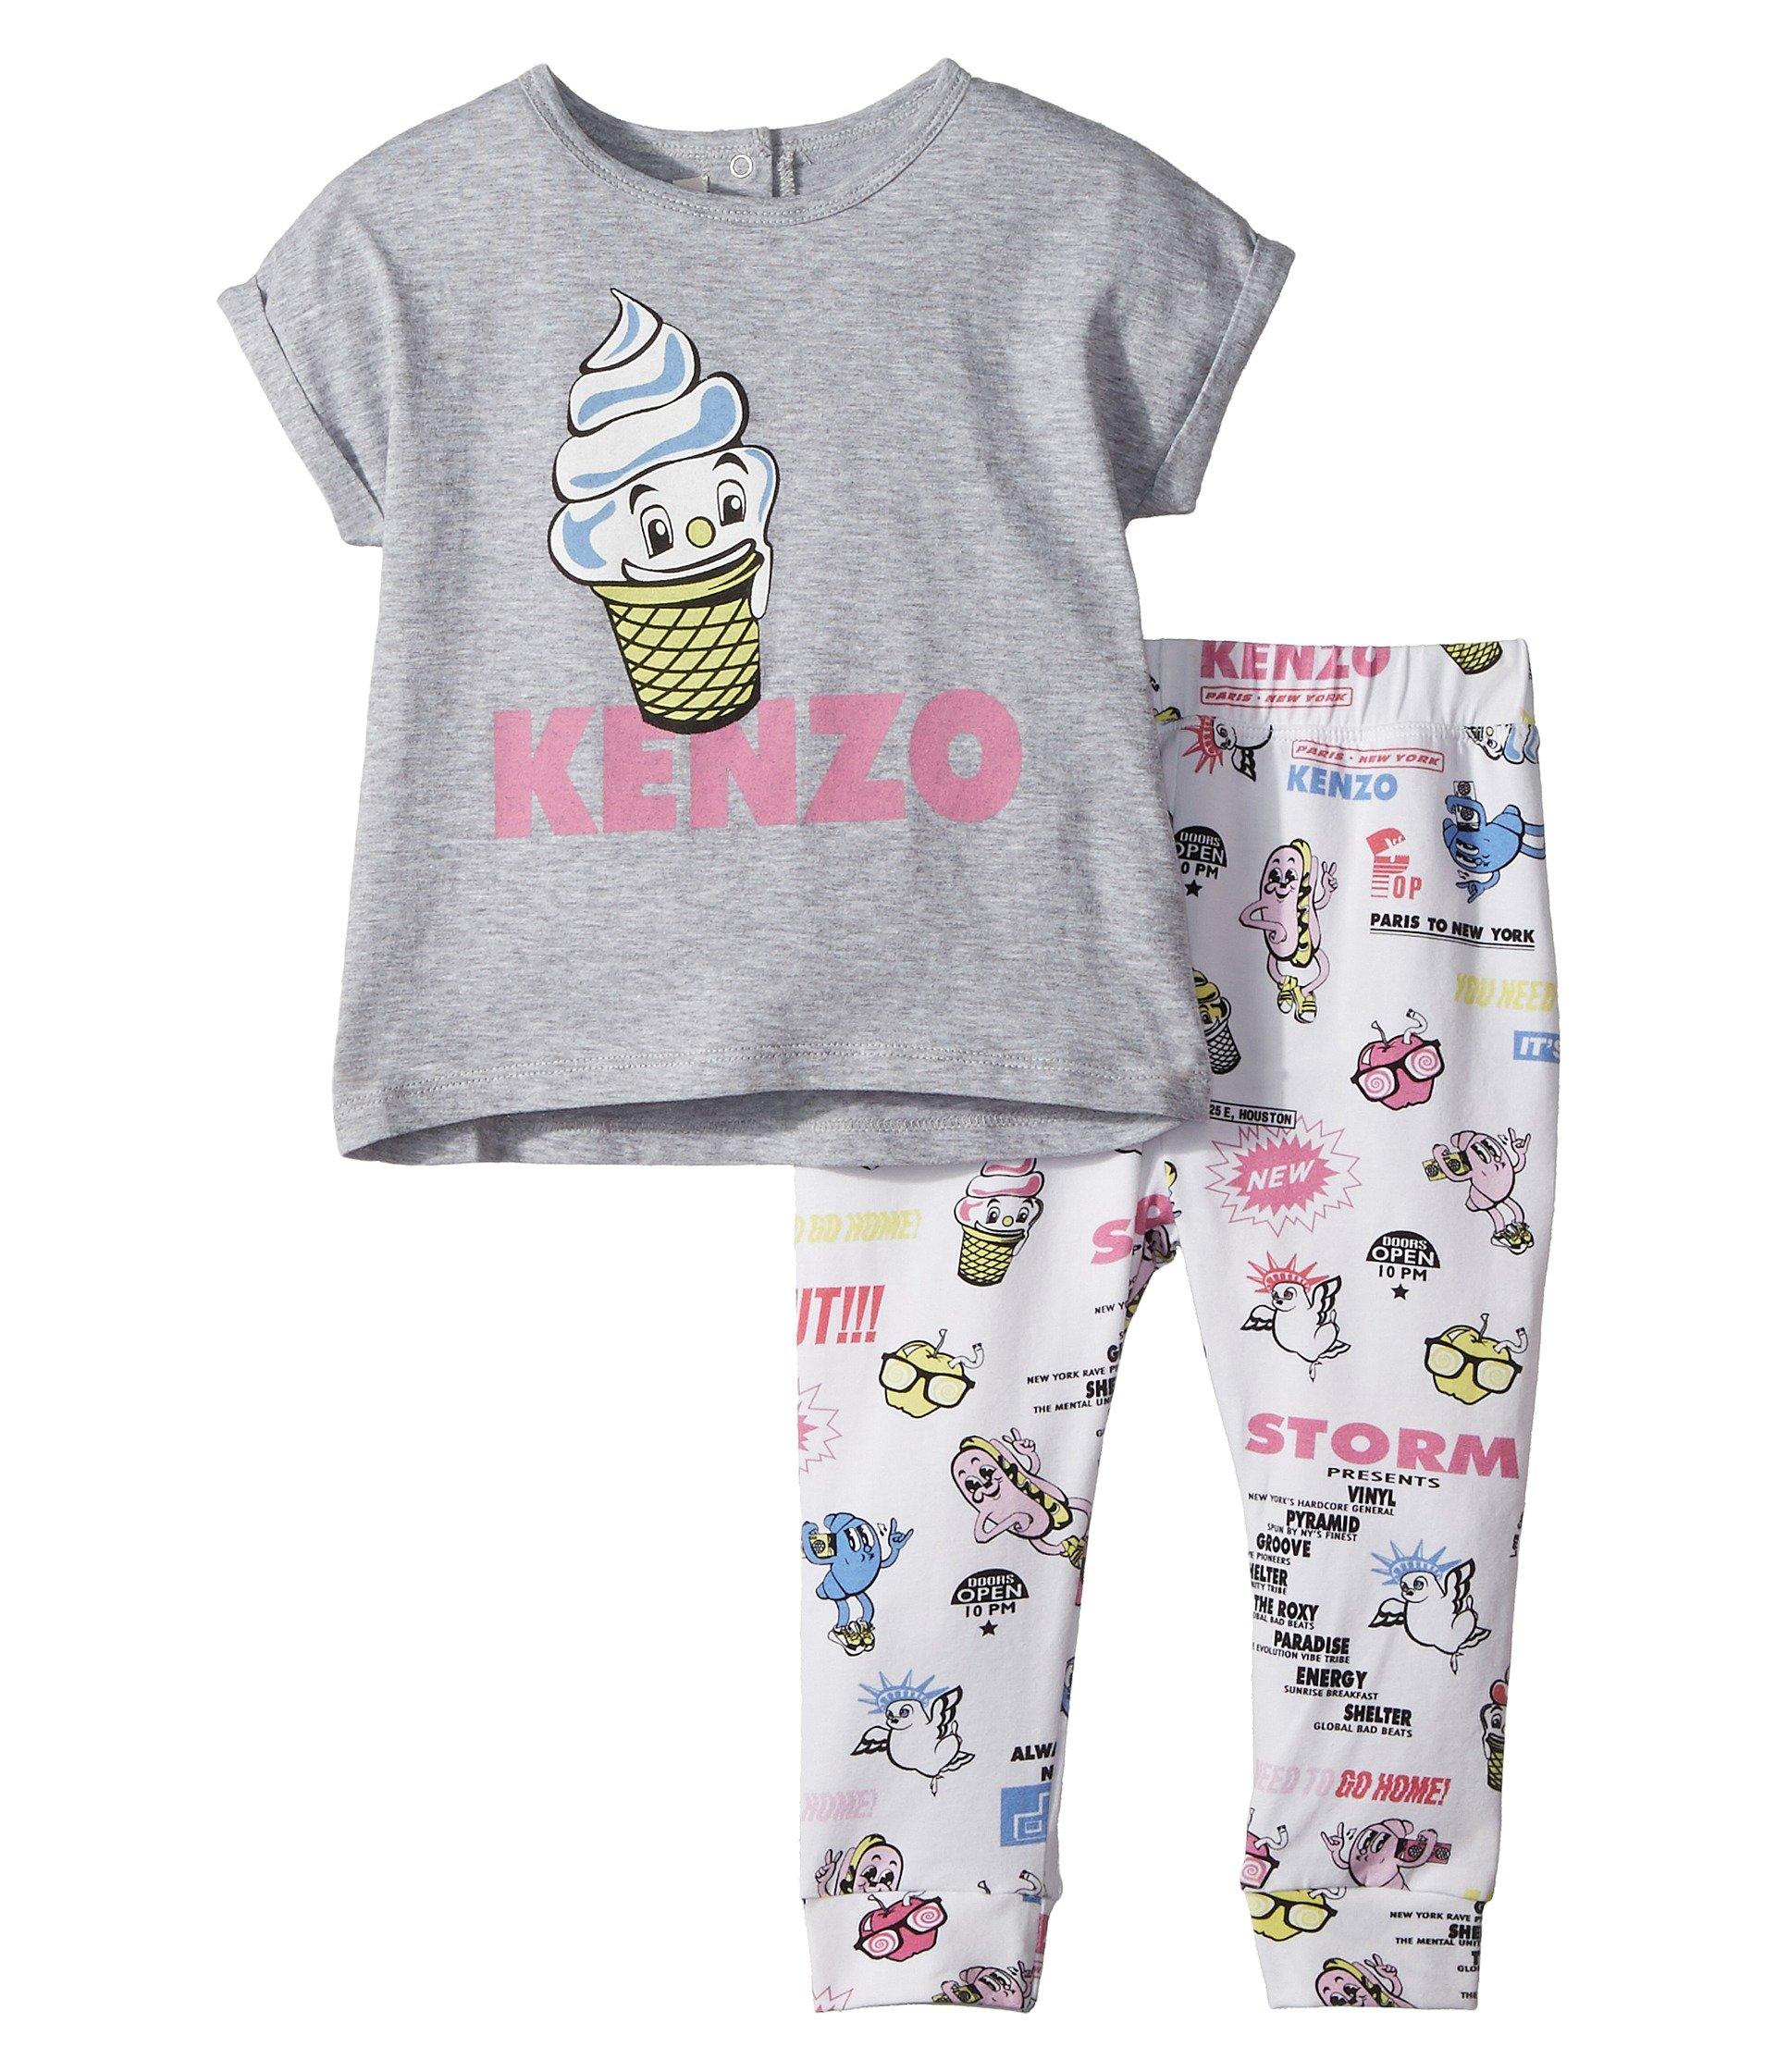 Kenzo Kids Clothing Girls